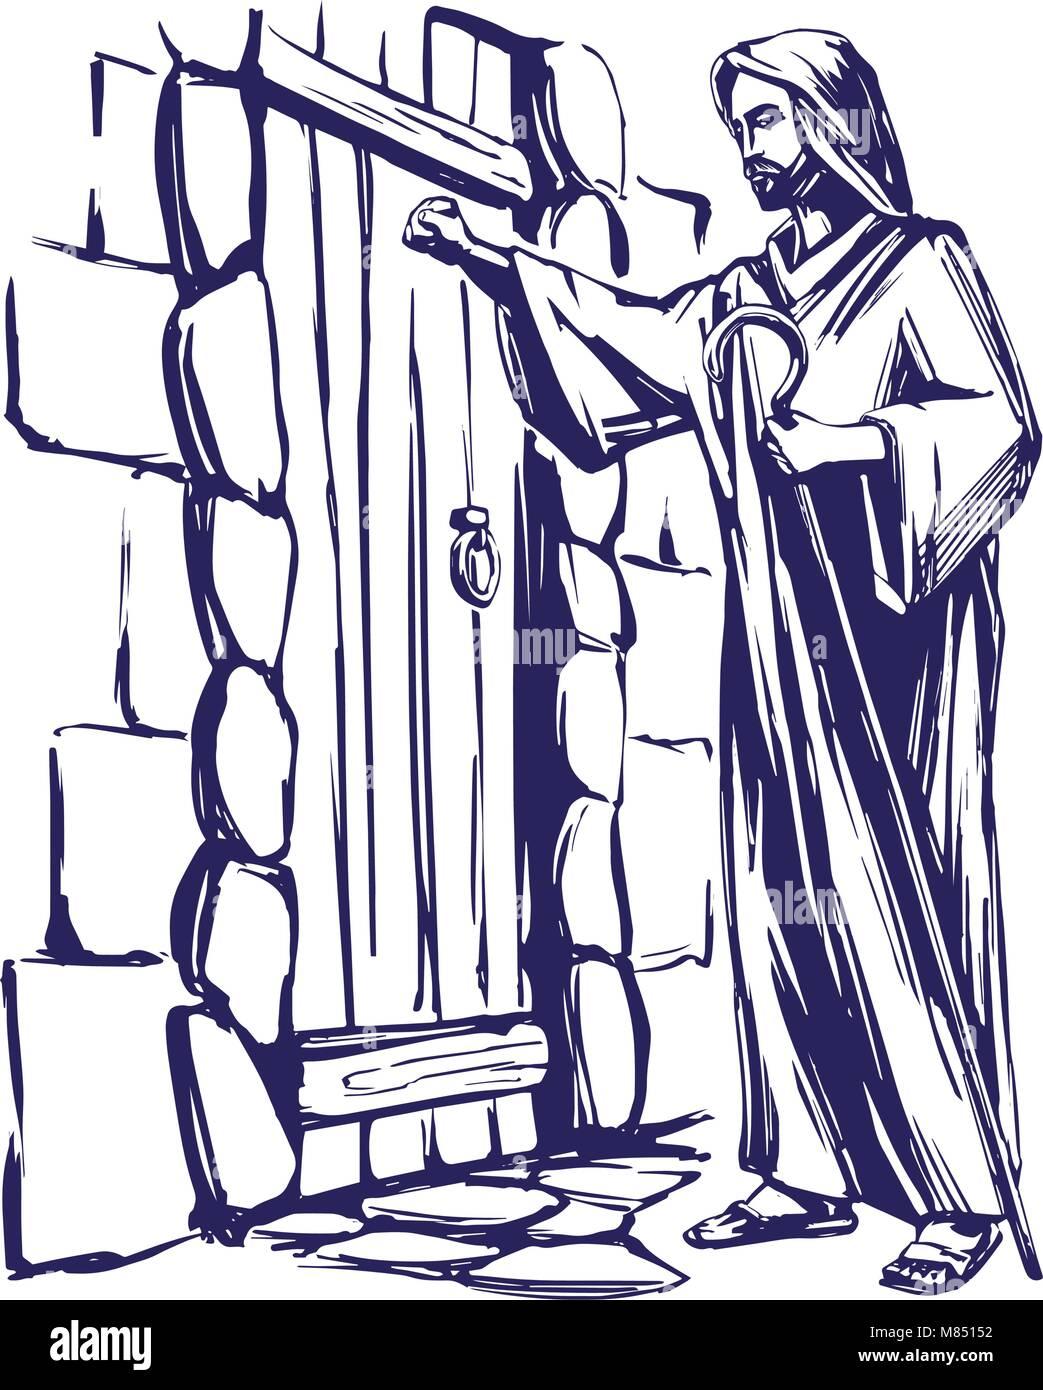 Door knock stock vector images alamy jesus christ son of god knocking at the door symbol of christianity hand drawn altavistaventures Gallery